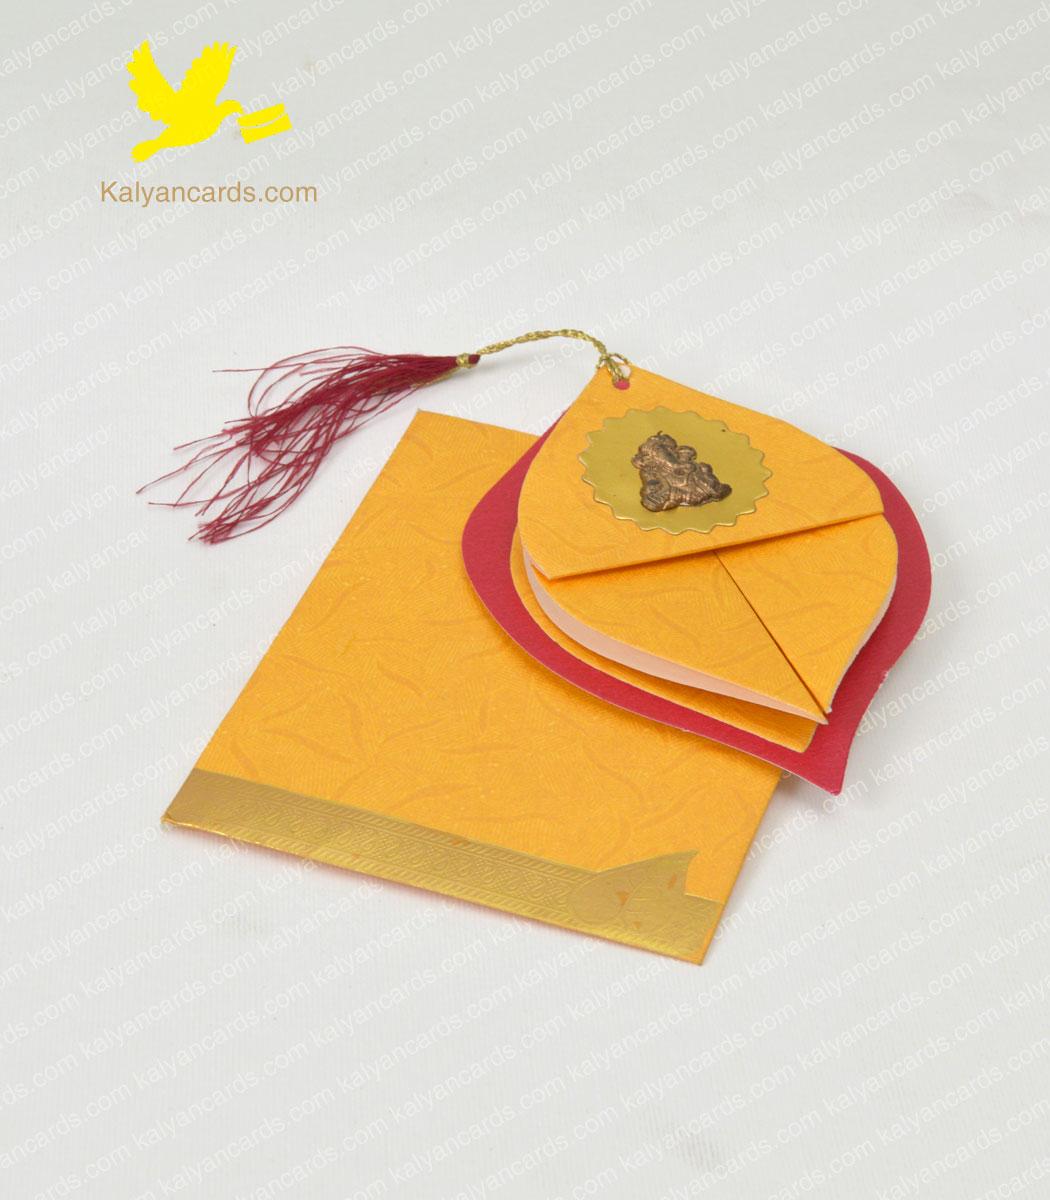 wedding cards bangalore personal